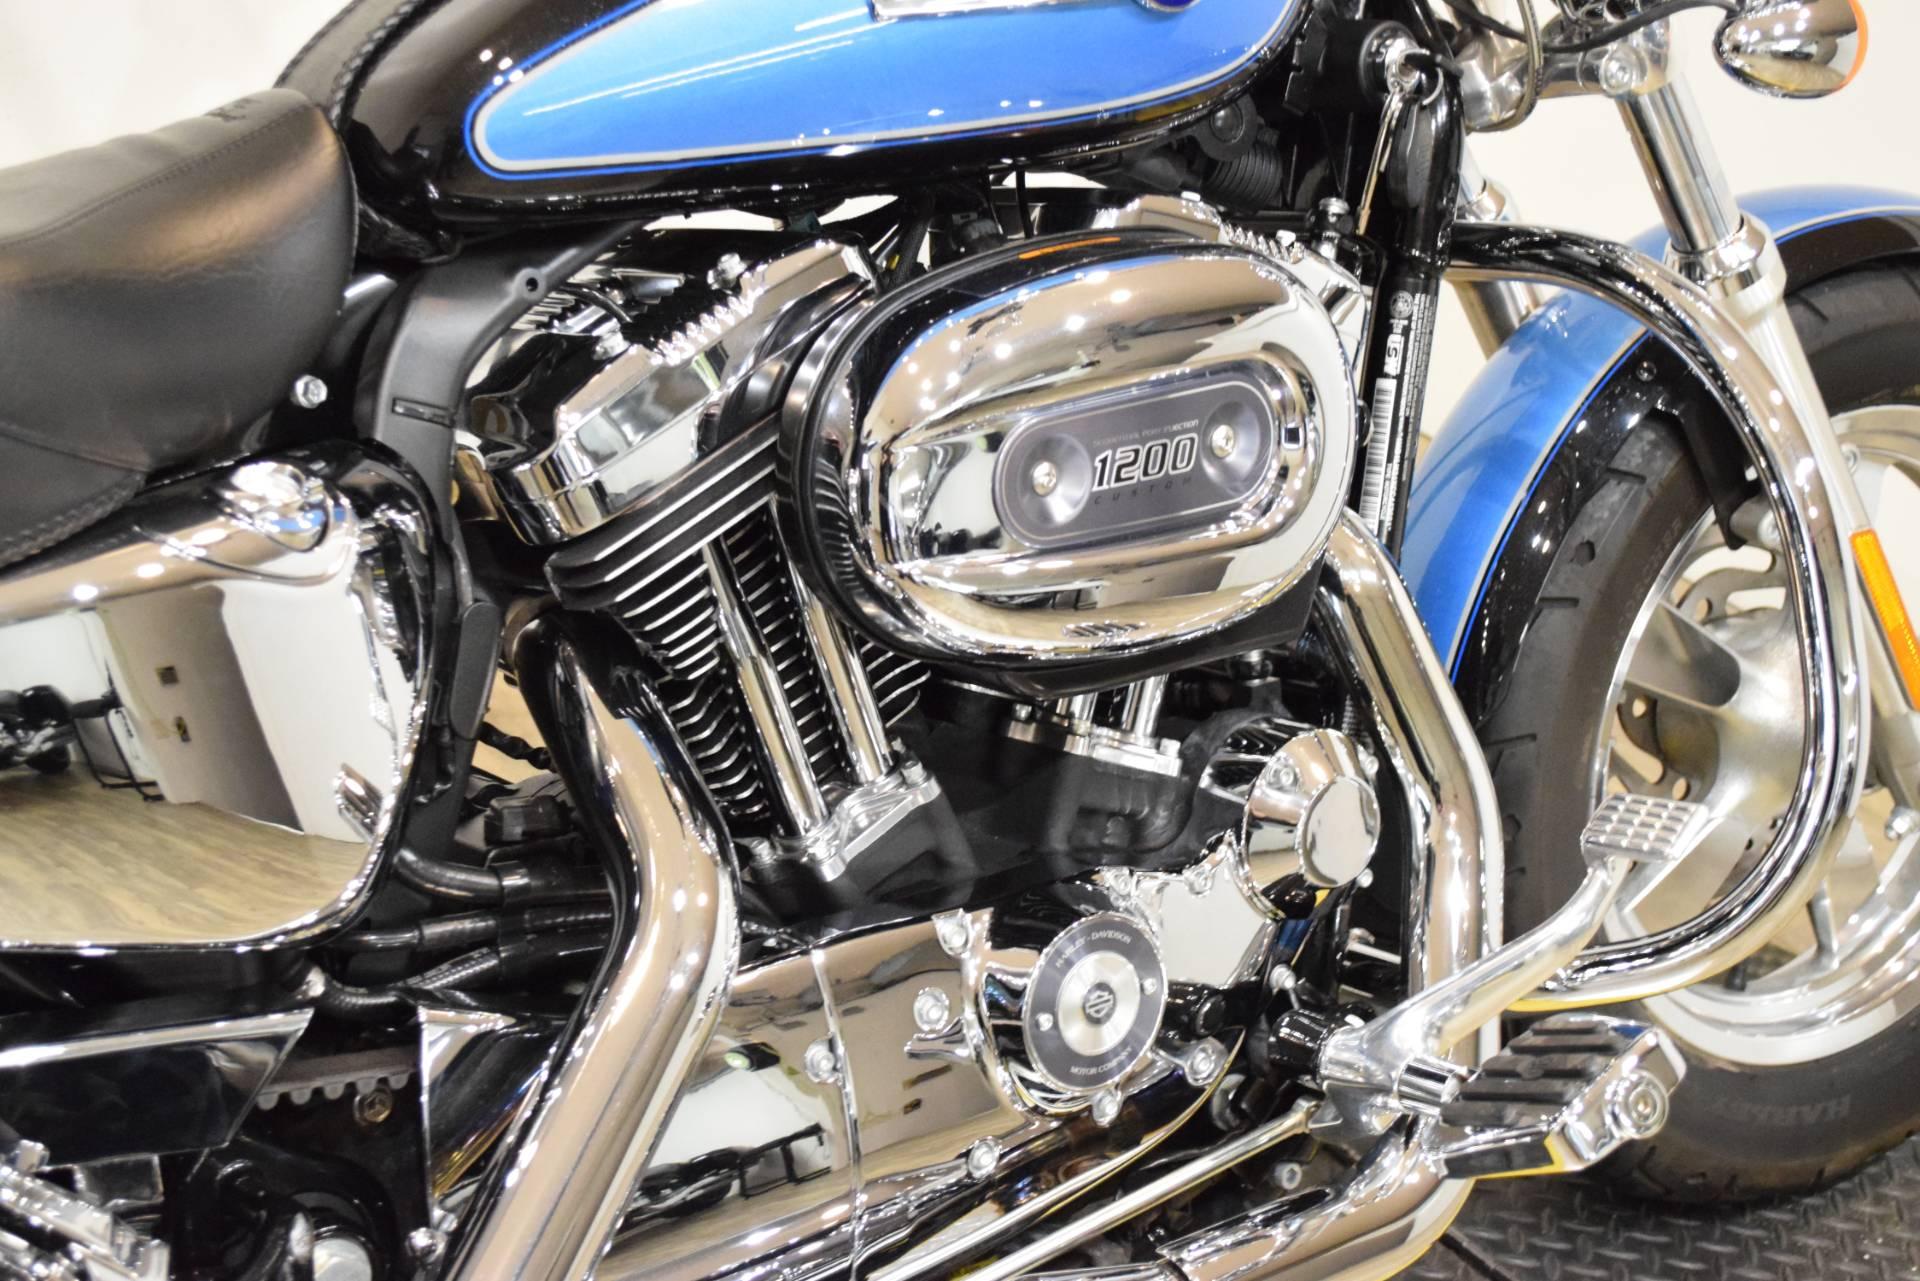 2012 Harley-Davidson XL1200C 7